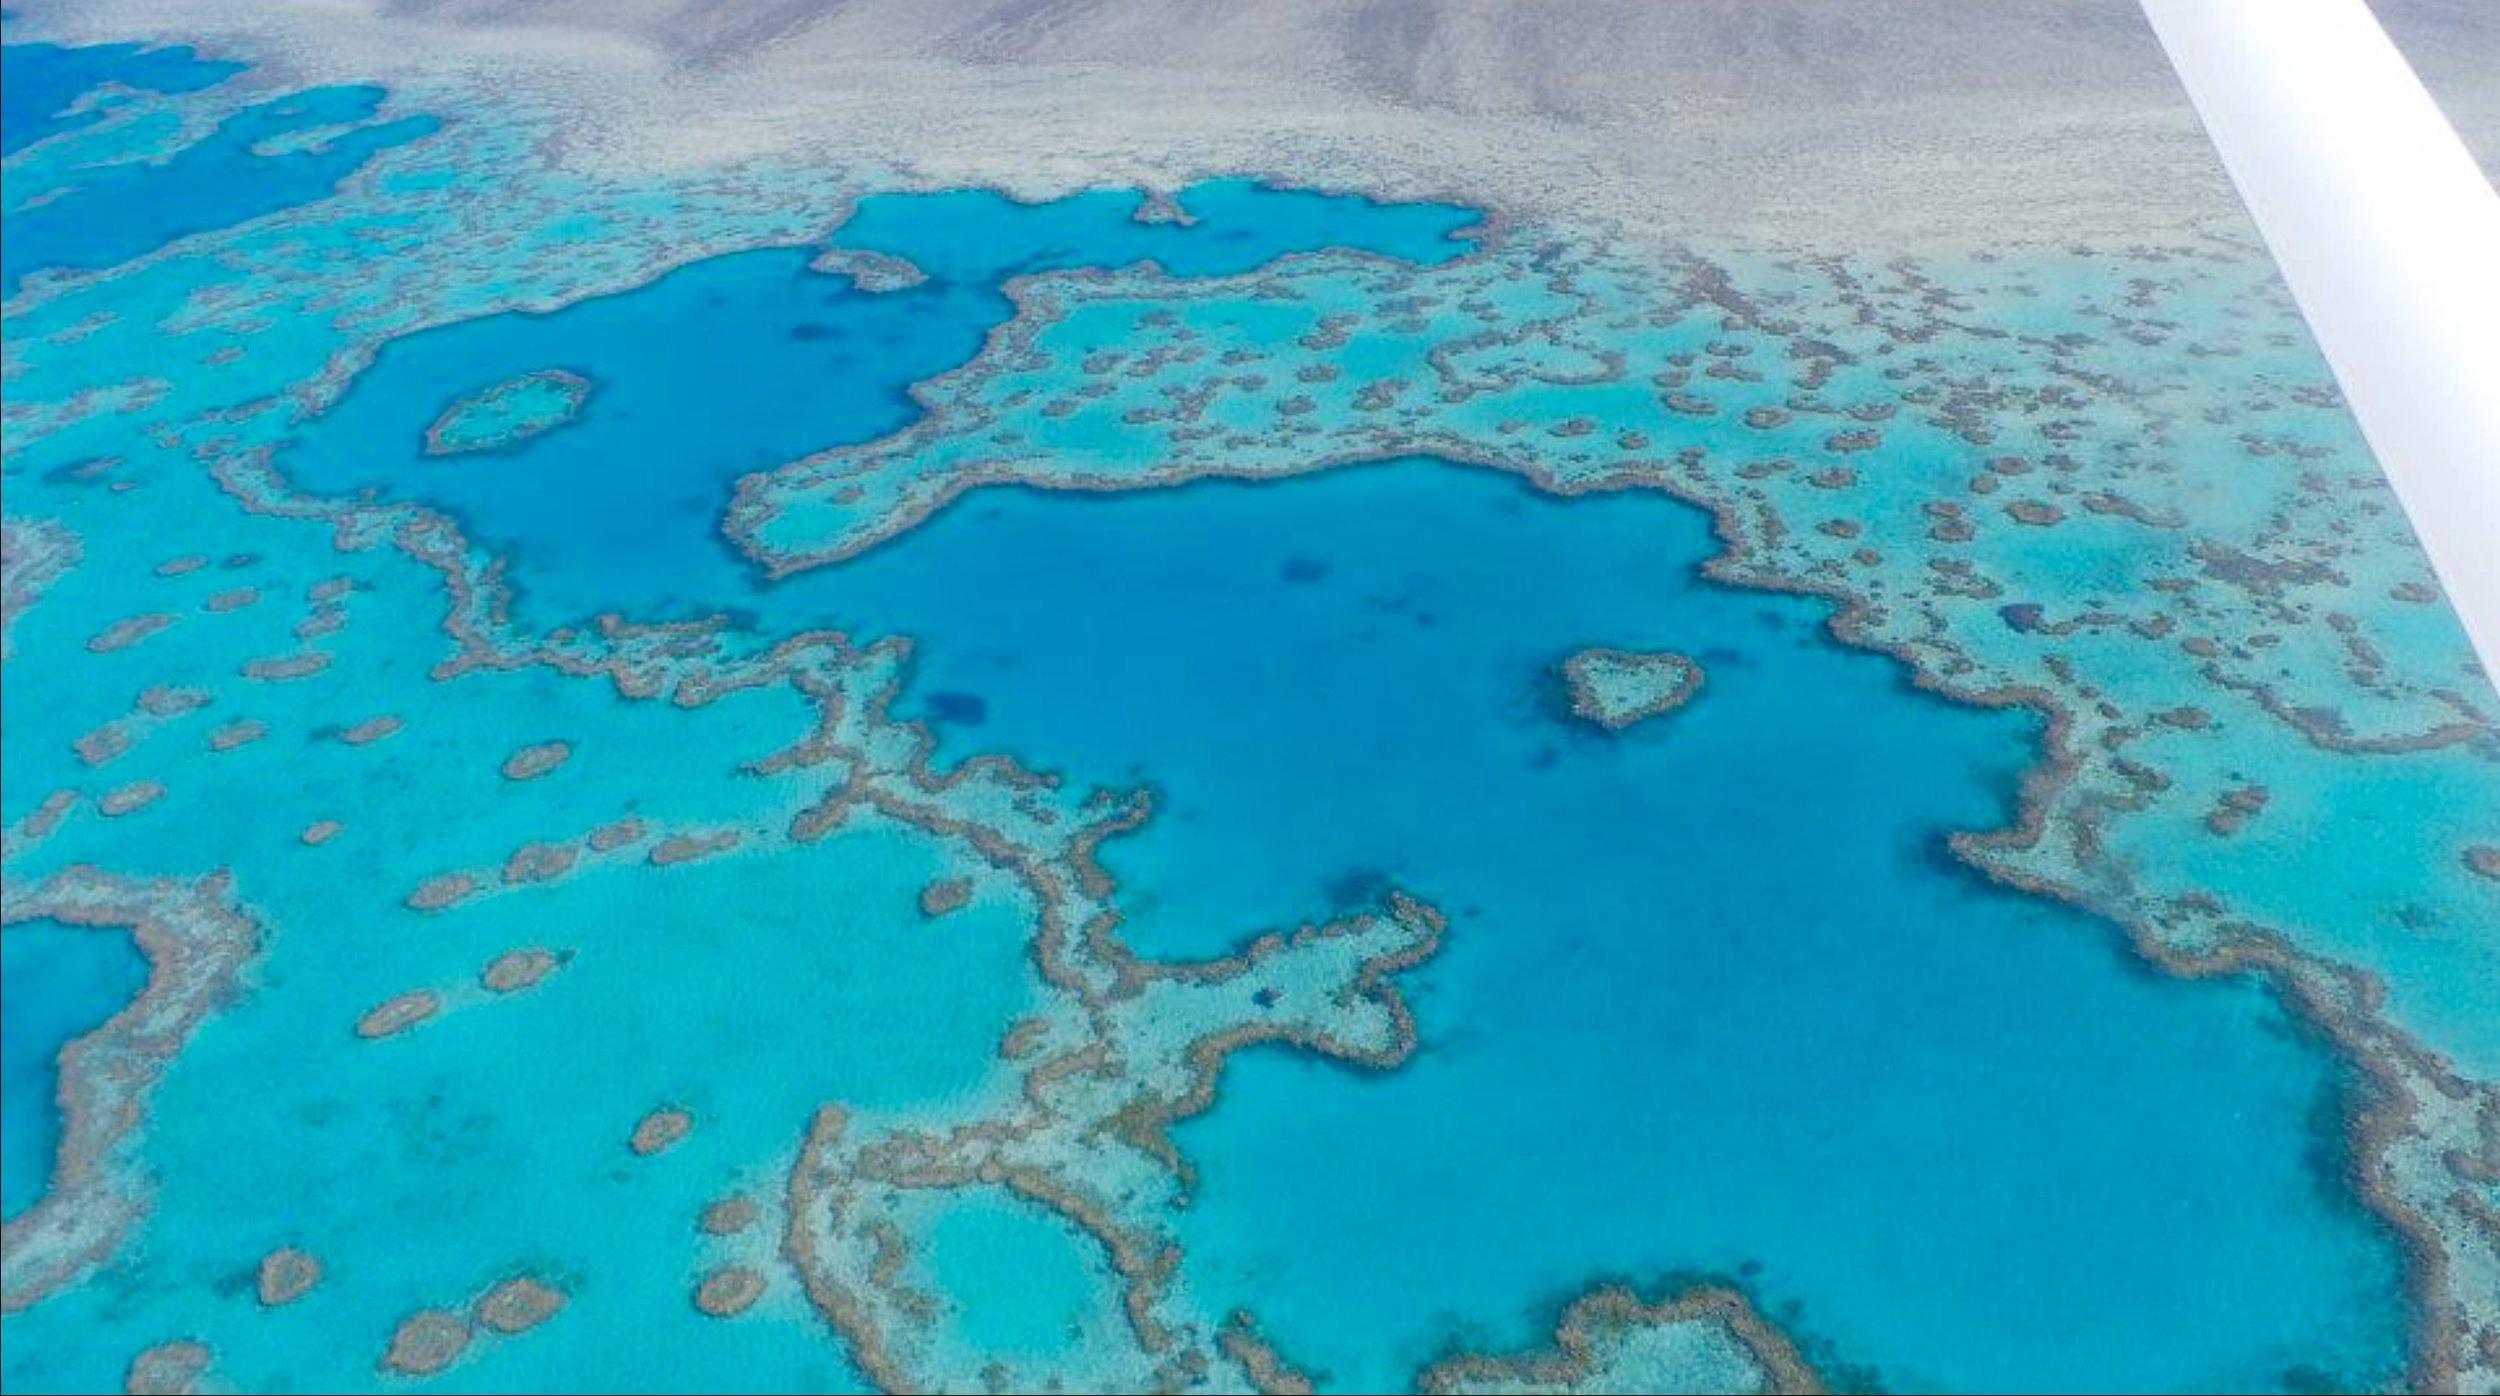 Flying over Heart Reef